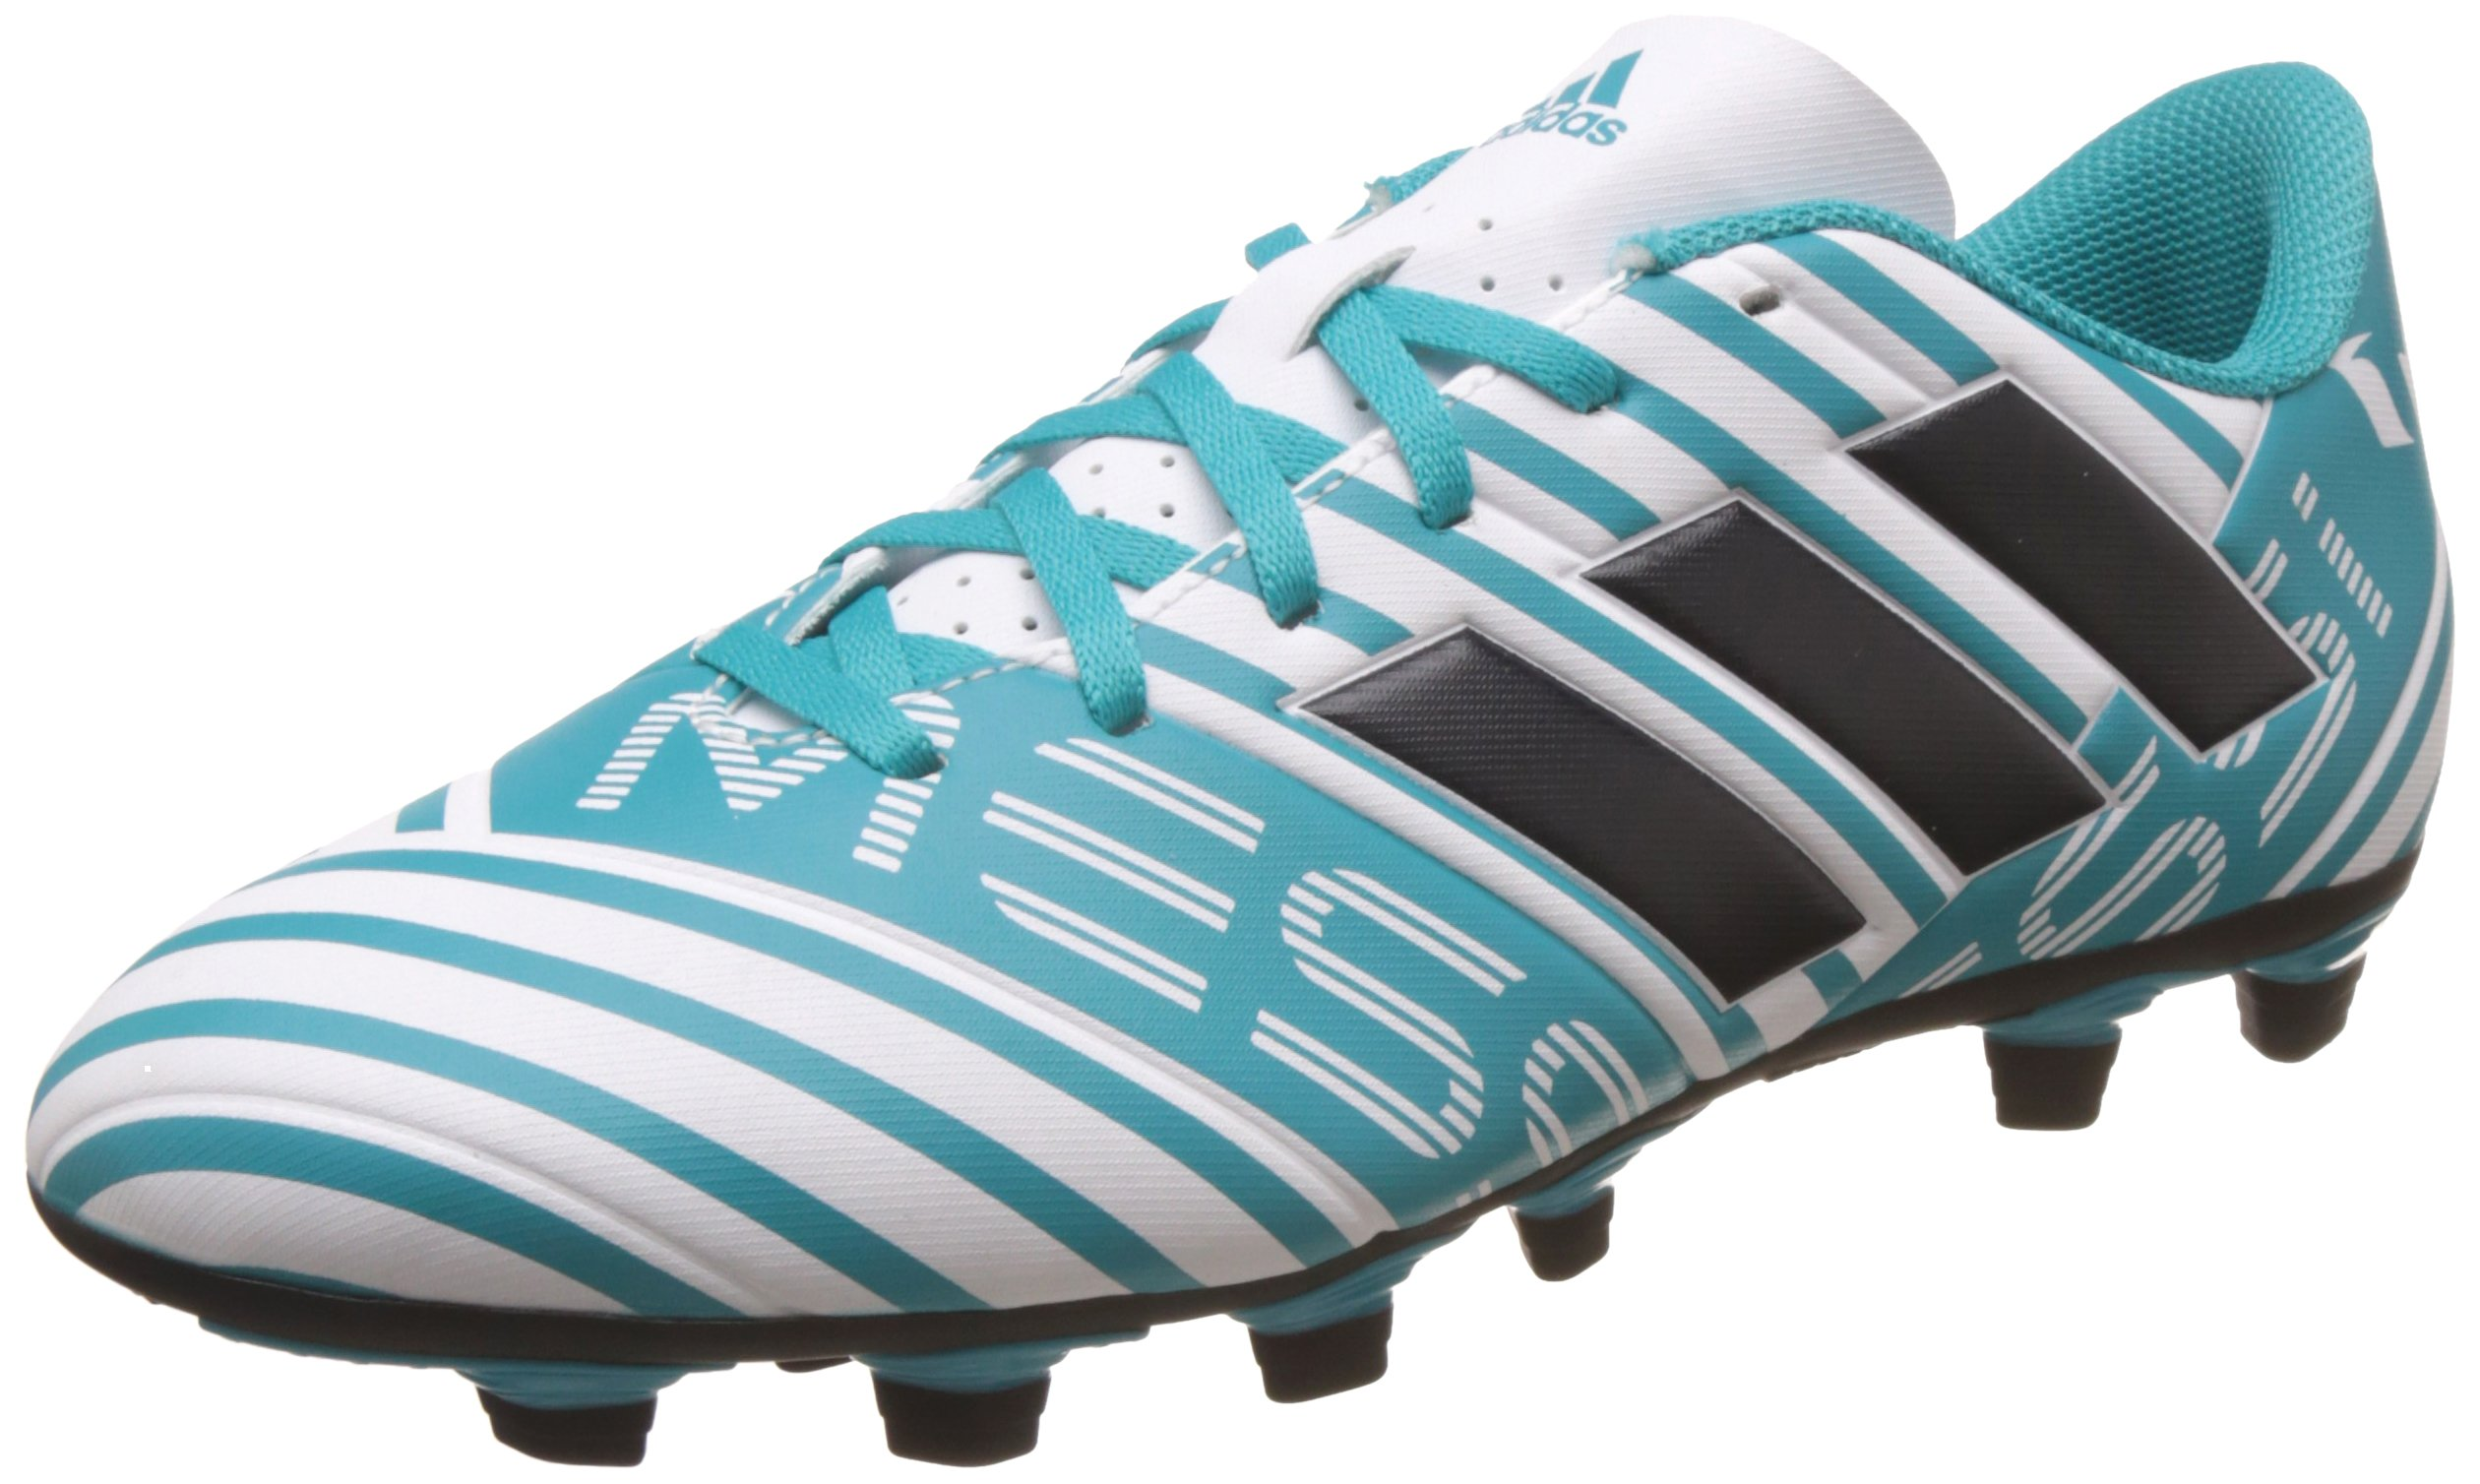 17 FxgChaussures Ink HommeBleufootwear White Adidas Blue47 Nemeziz 3 Messi energy legend De 1 Eu 4 Football 0NnwvOm8